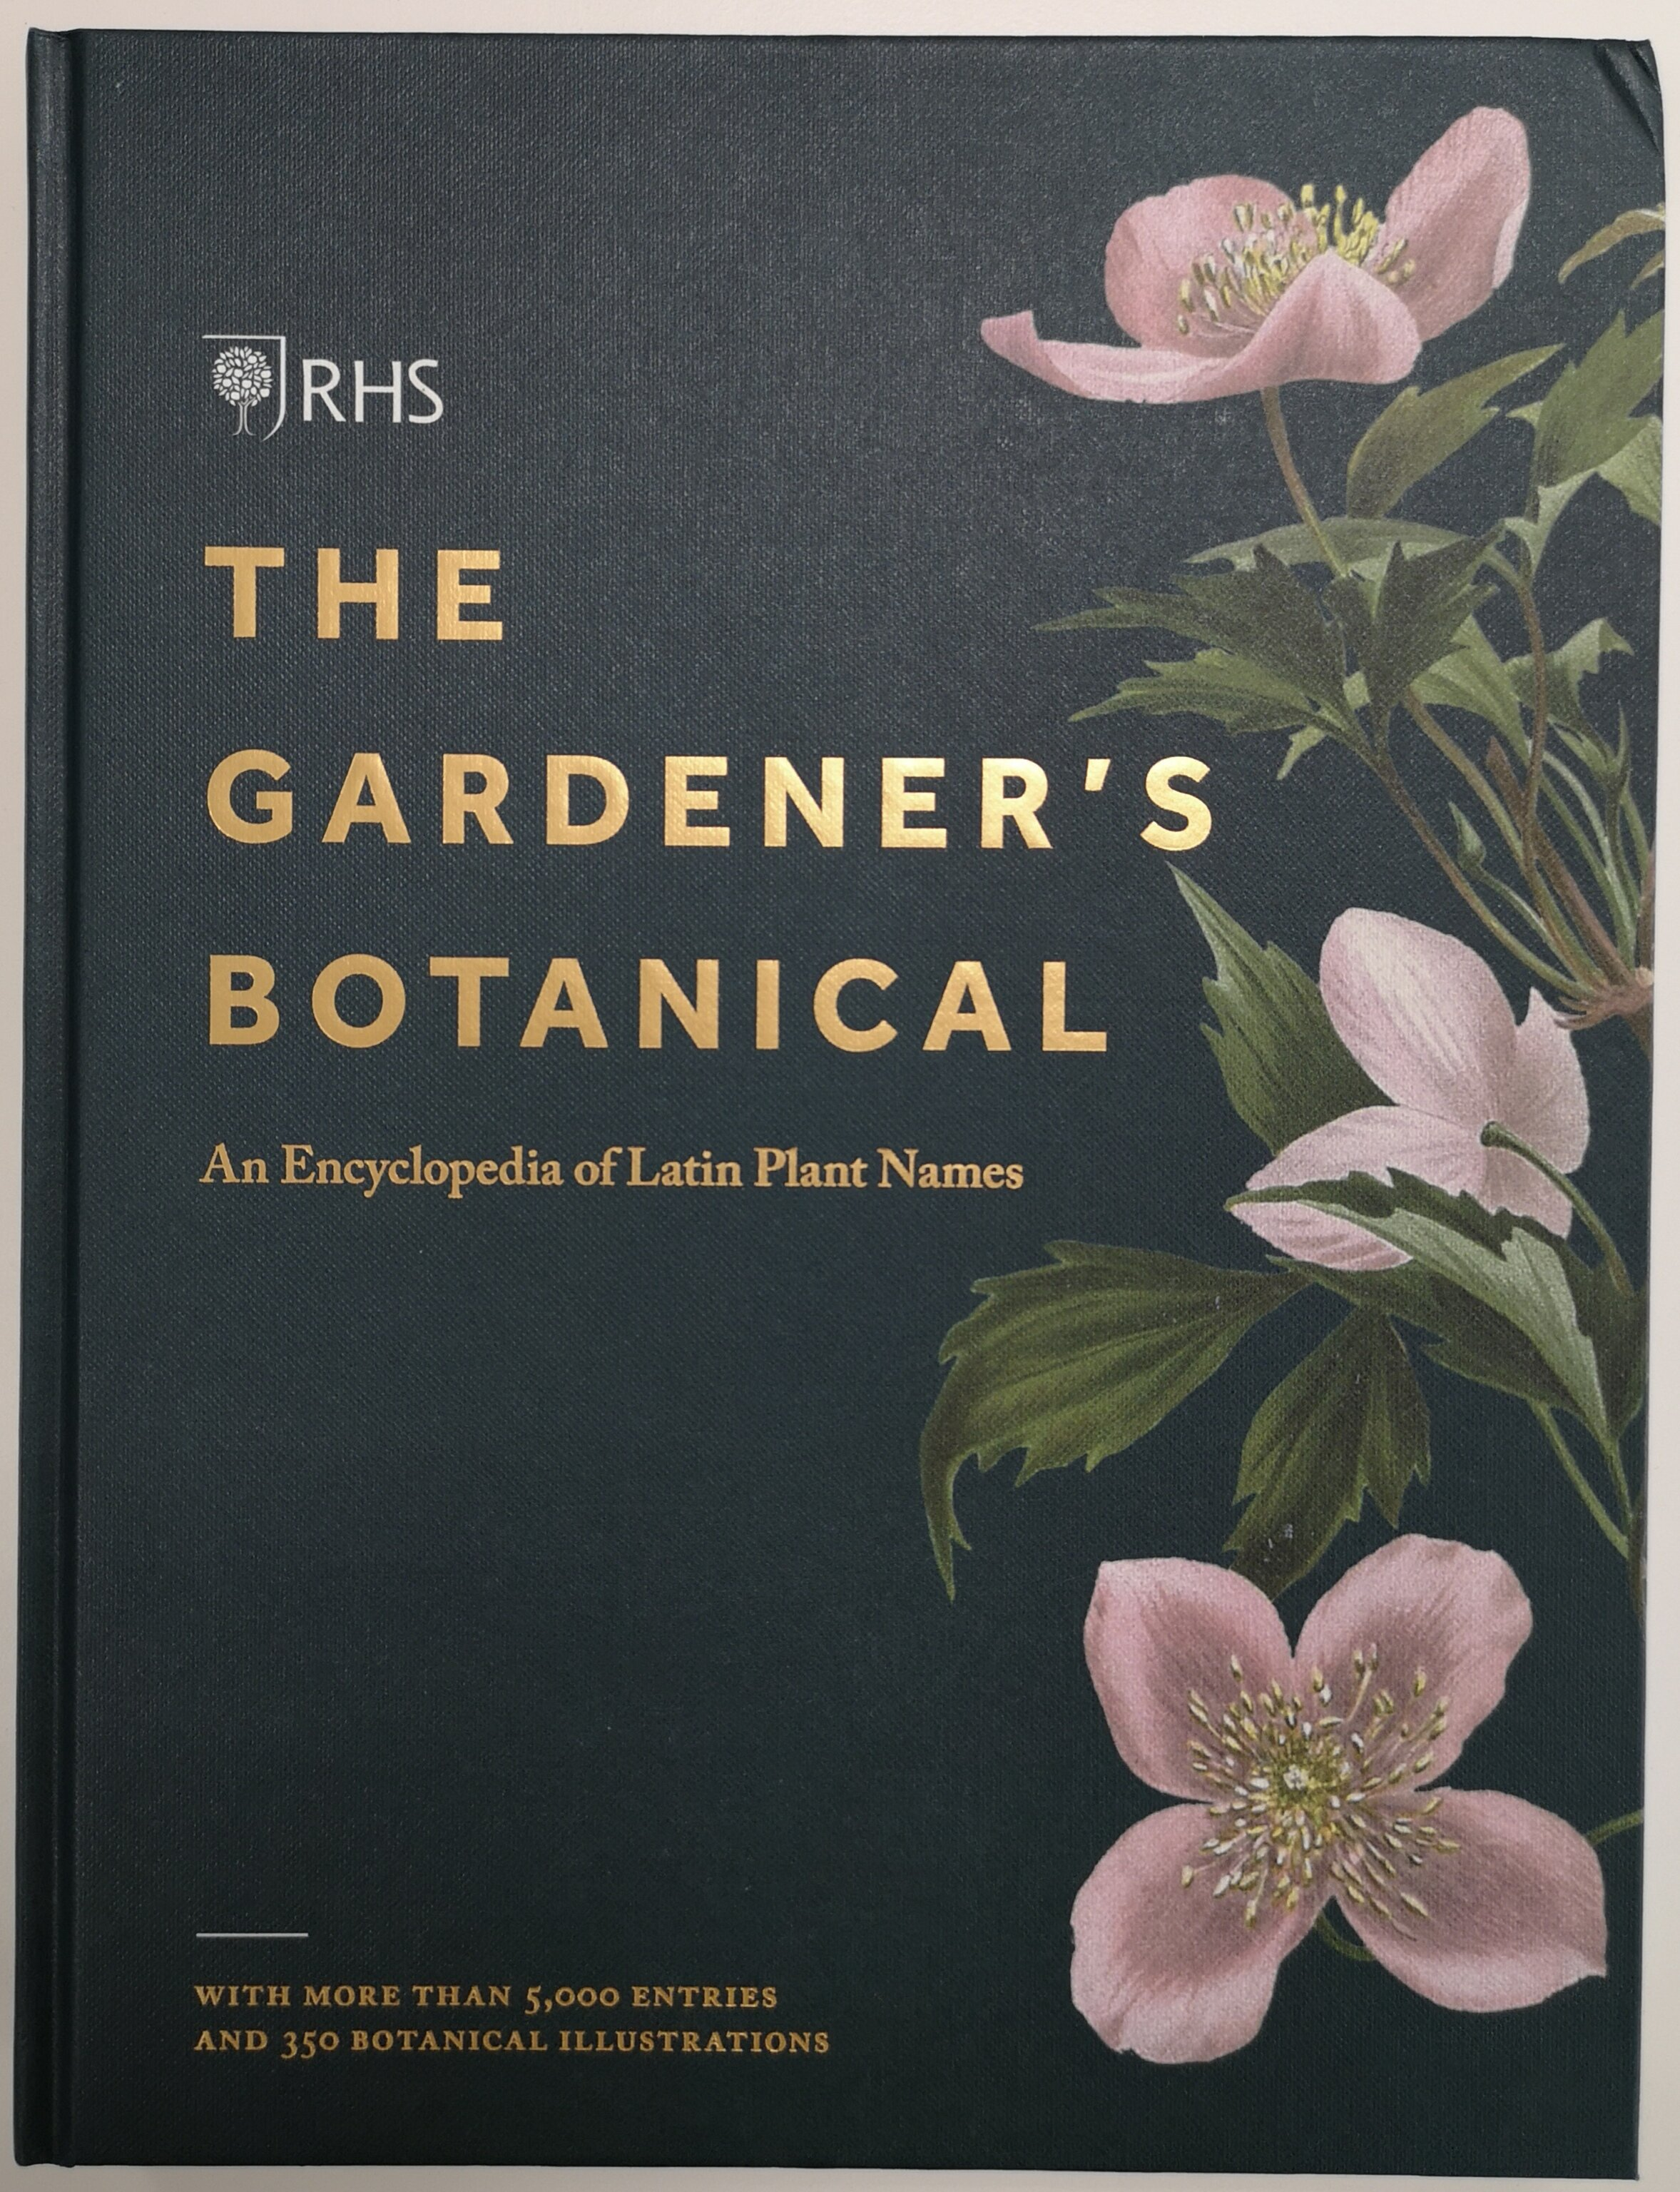 Encyclopedia of Latin Plant Names